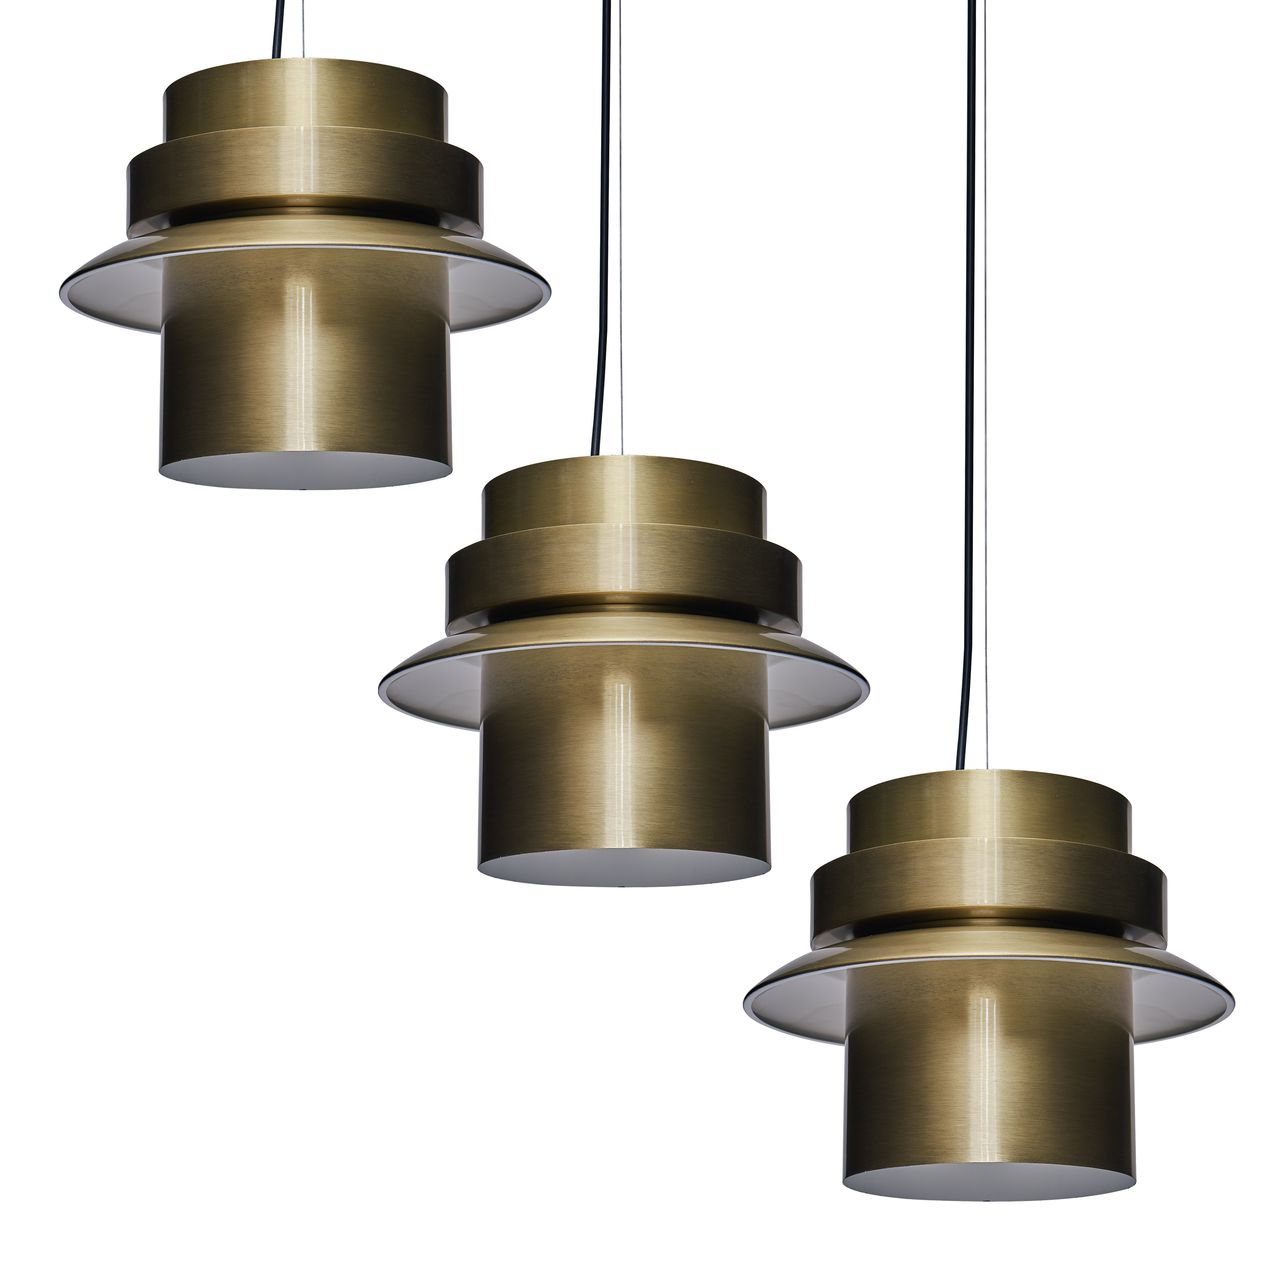 SEI Alistar Metal Art Deco Pendant Light in Antique Brass - Set of 3